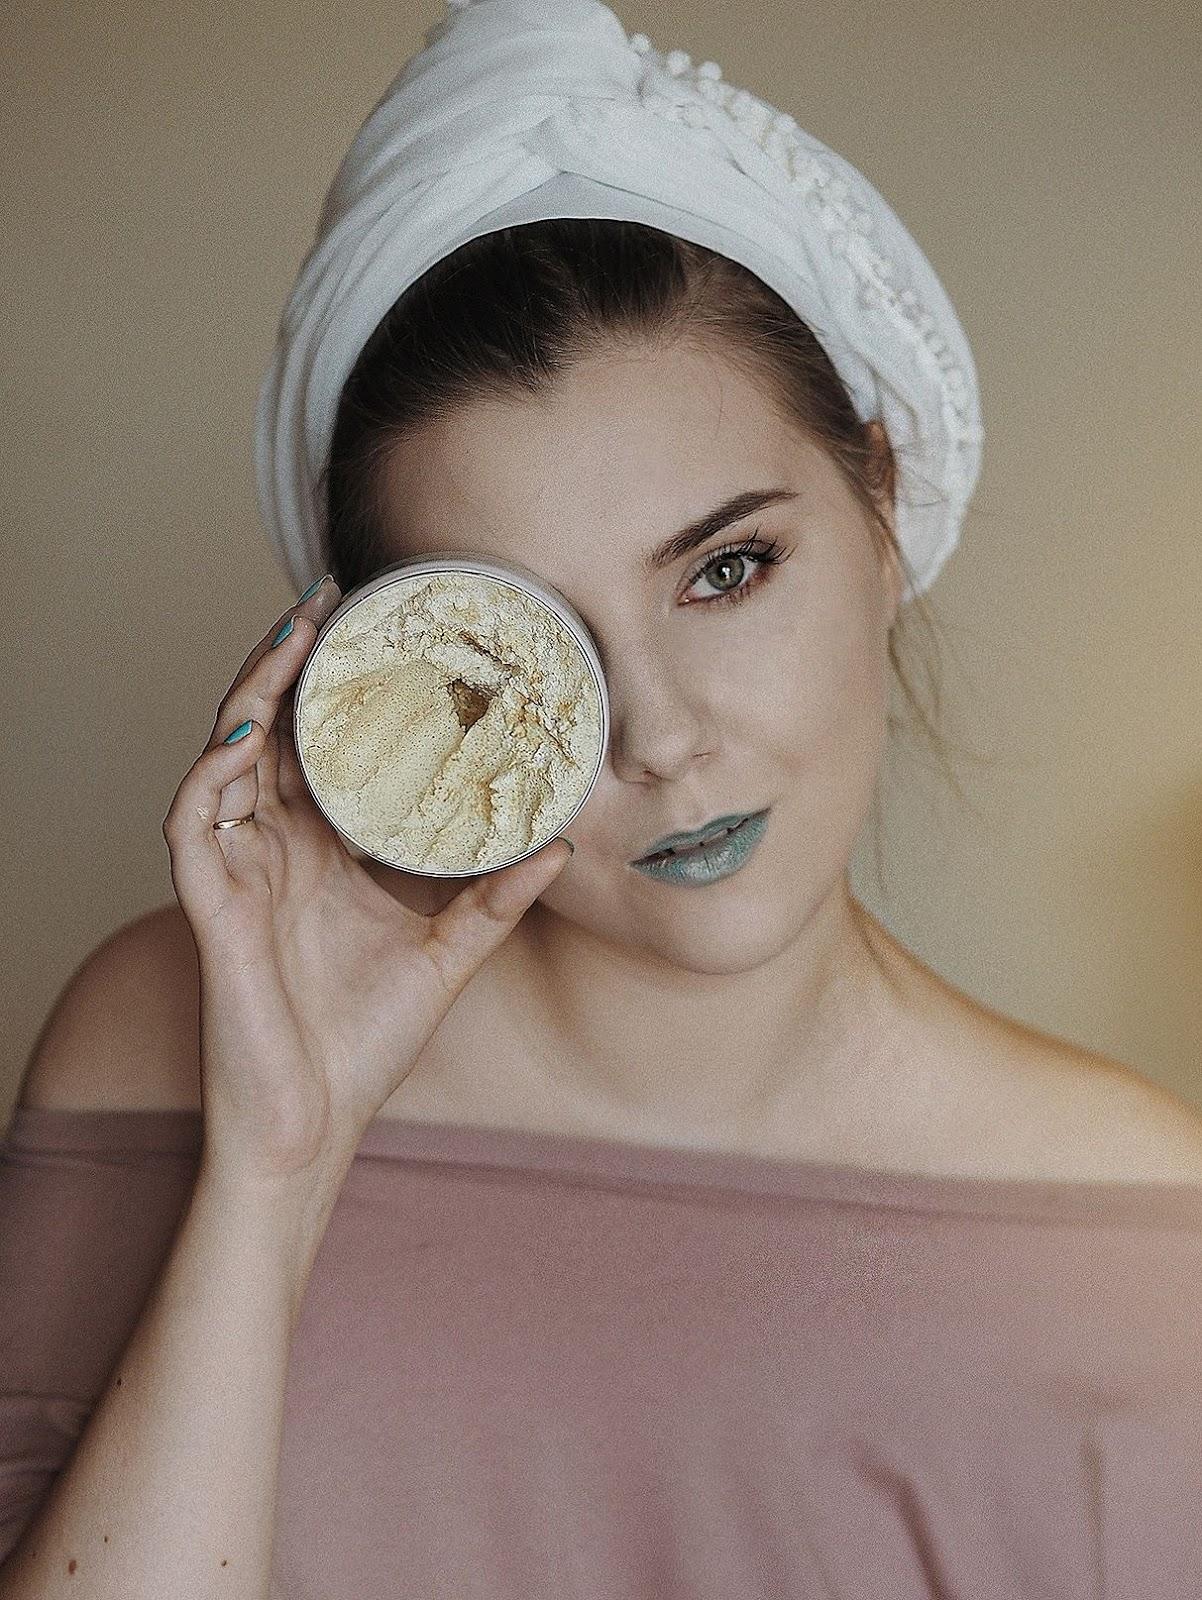 Ekstrawagancka Kosmetyki Polska Blogerka Opinia